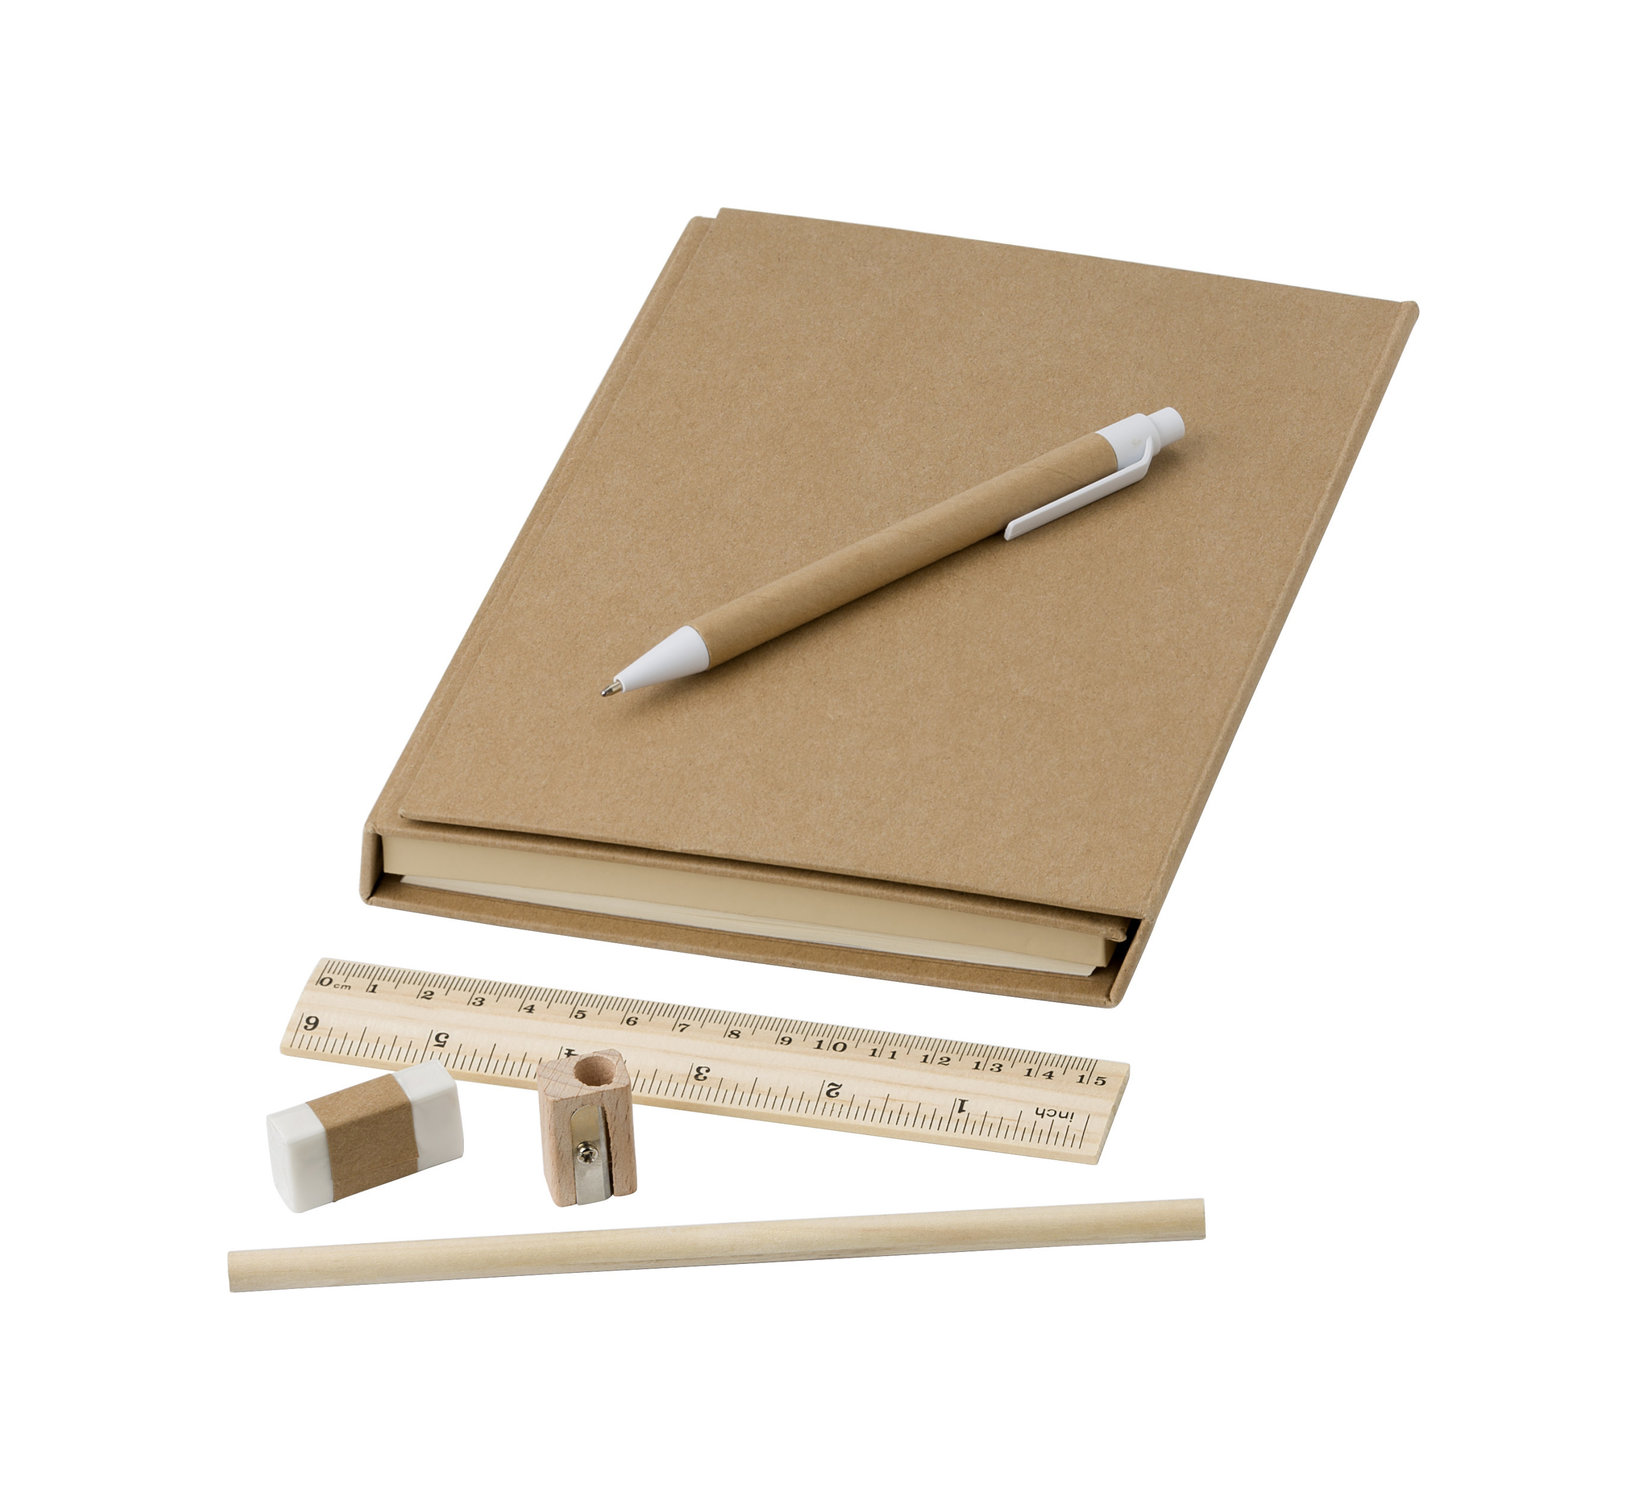 Conférencier en carton avec bloc-notes